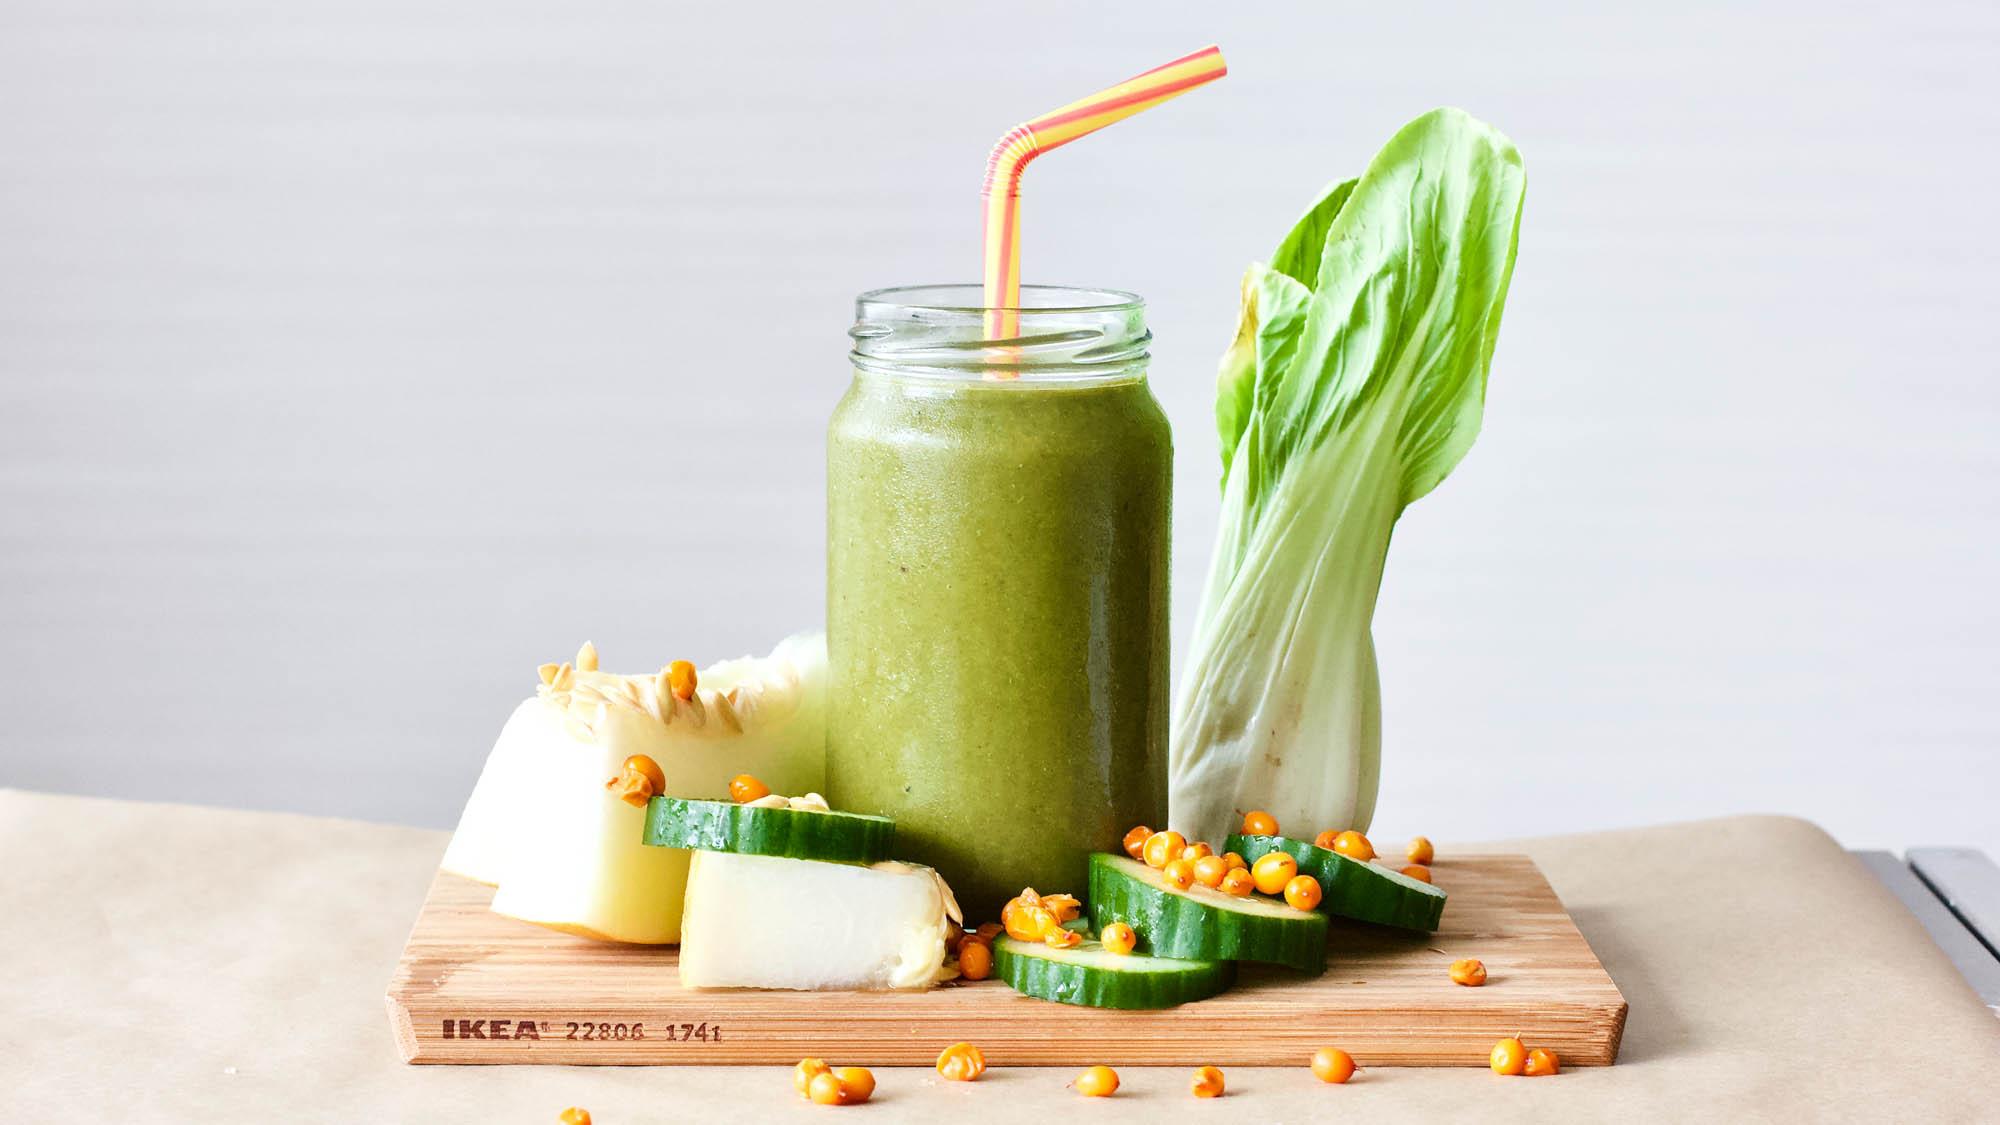 Galia Melon Green Shot Smoothie